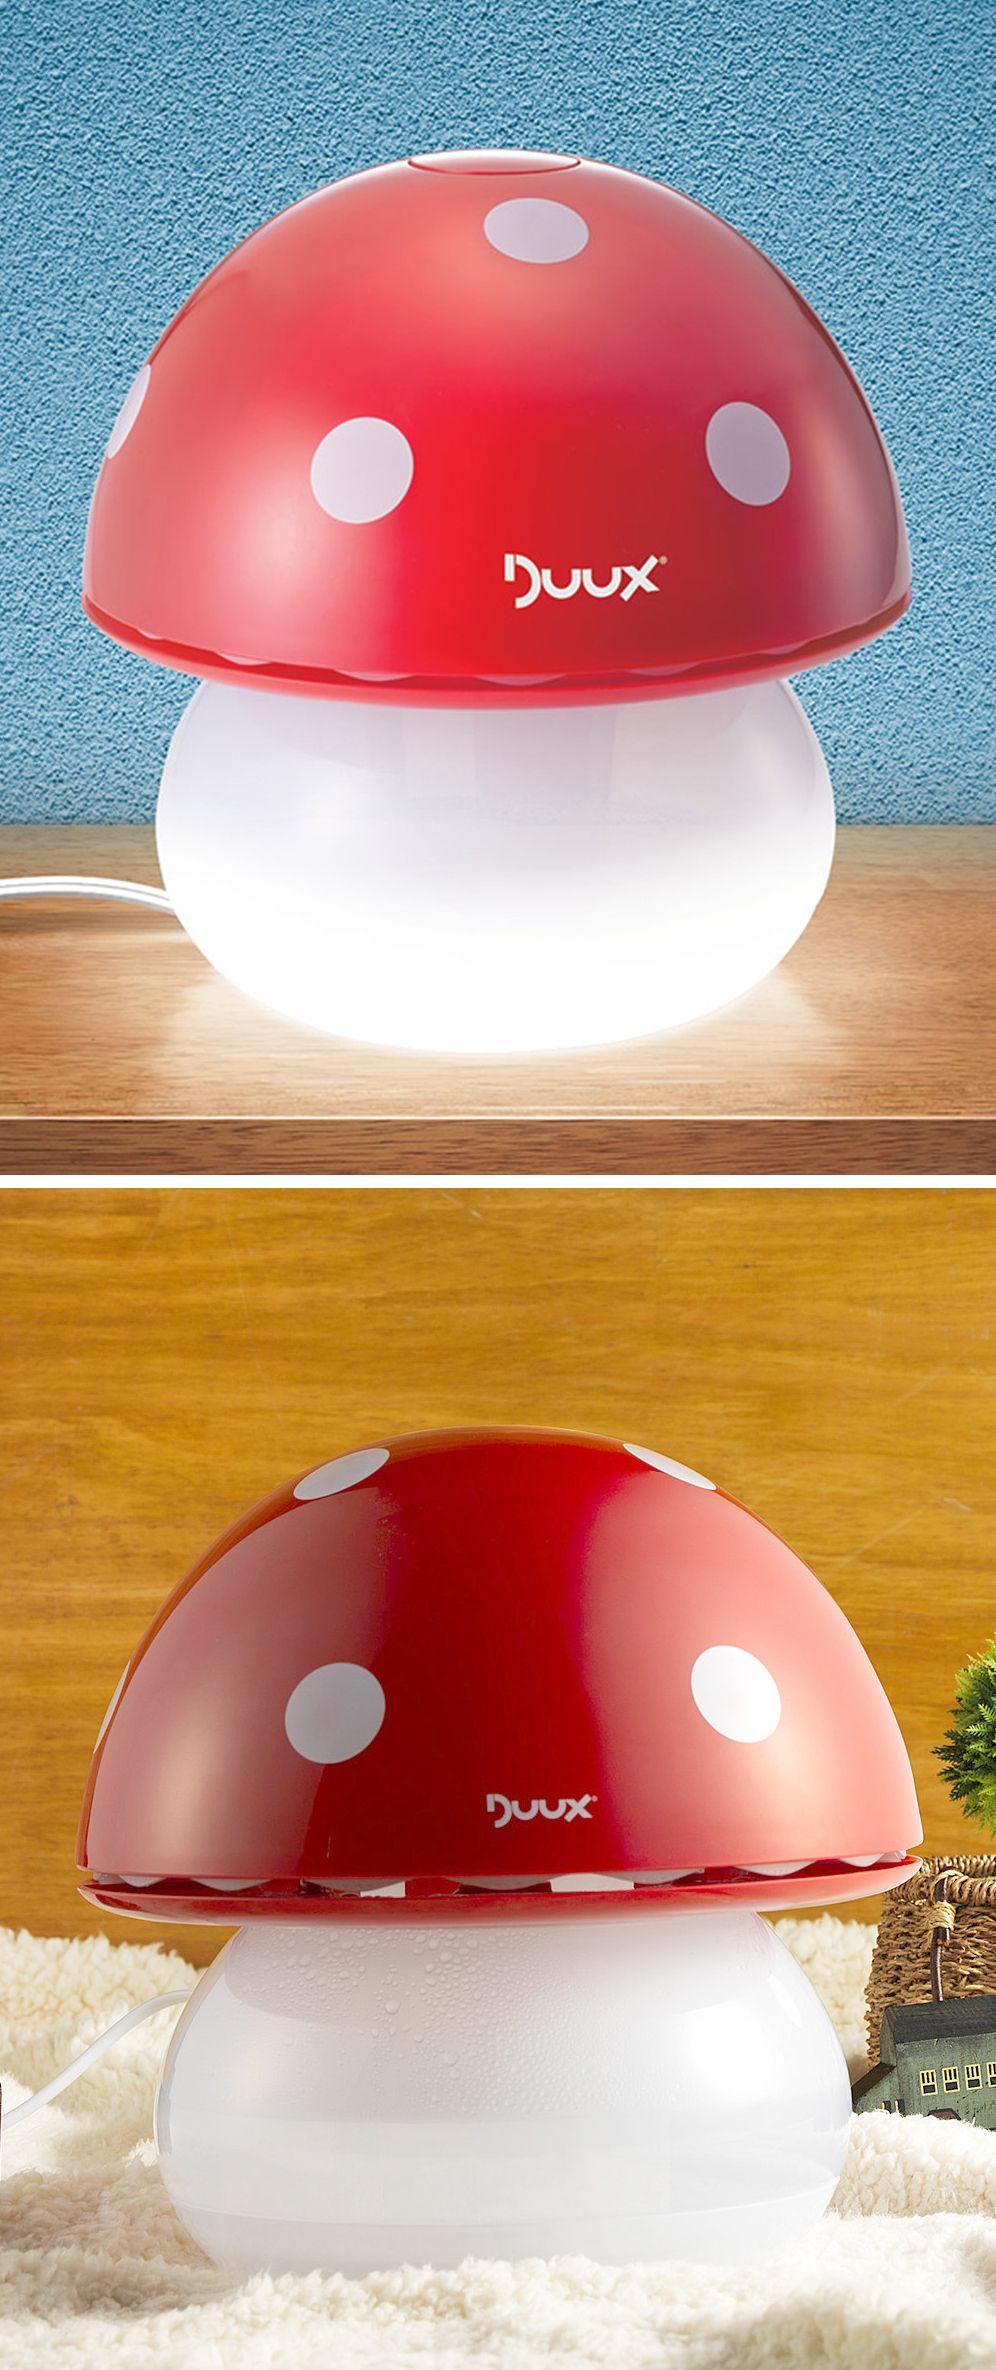 Mushroom Humidifier Nightlight Cute For Kid S Room Cool Baby Stuff Baby Room Colors Baby Friends